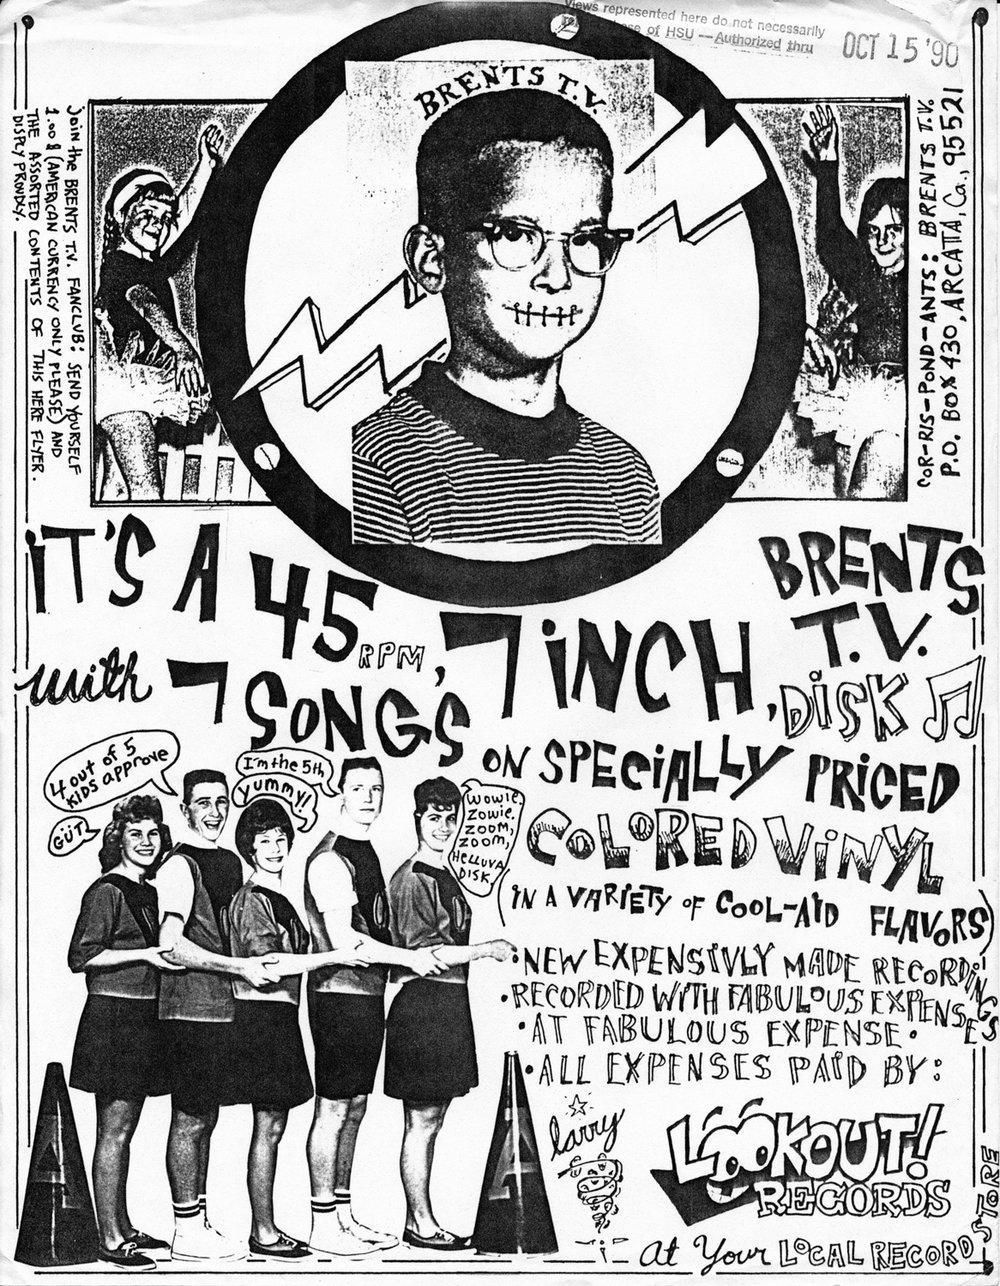 "For the Lumberjack Days 7"" (Oct. 1990)"